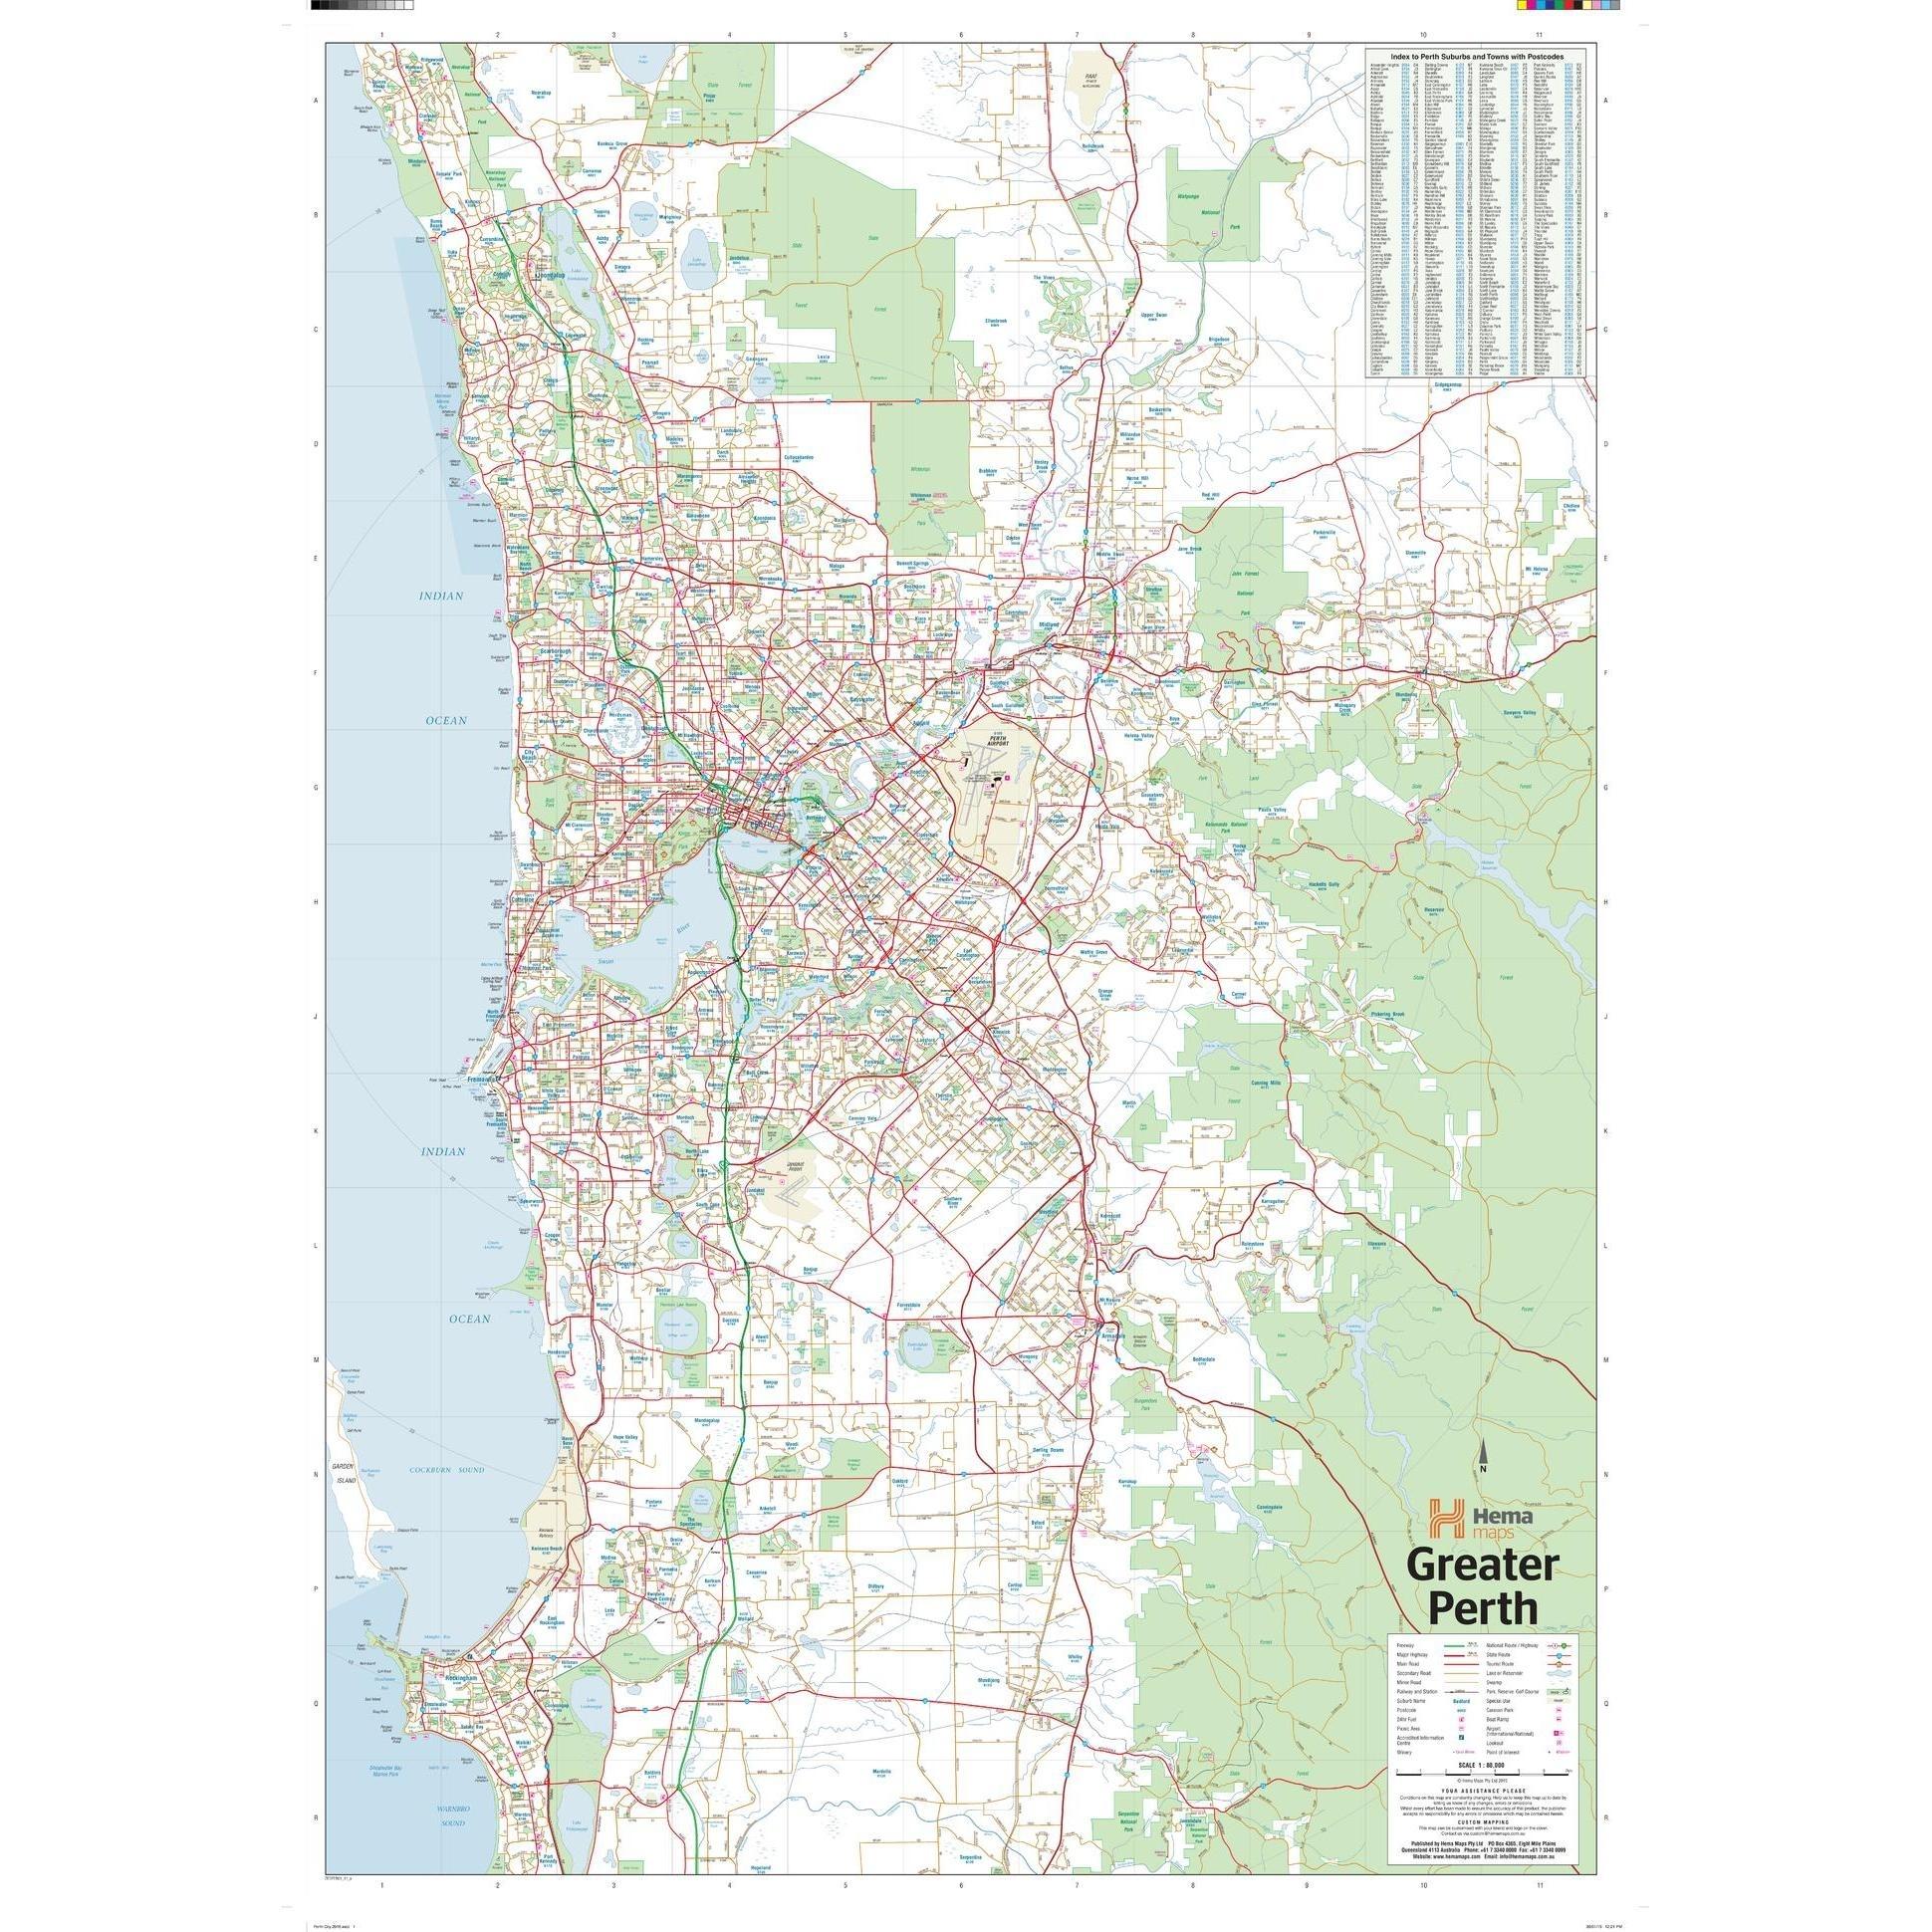 Perth, Australia Regional Wall Map with regard to Map Of Perth Australia Suburbs